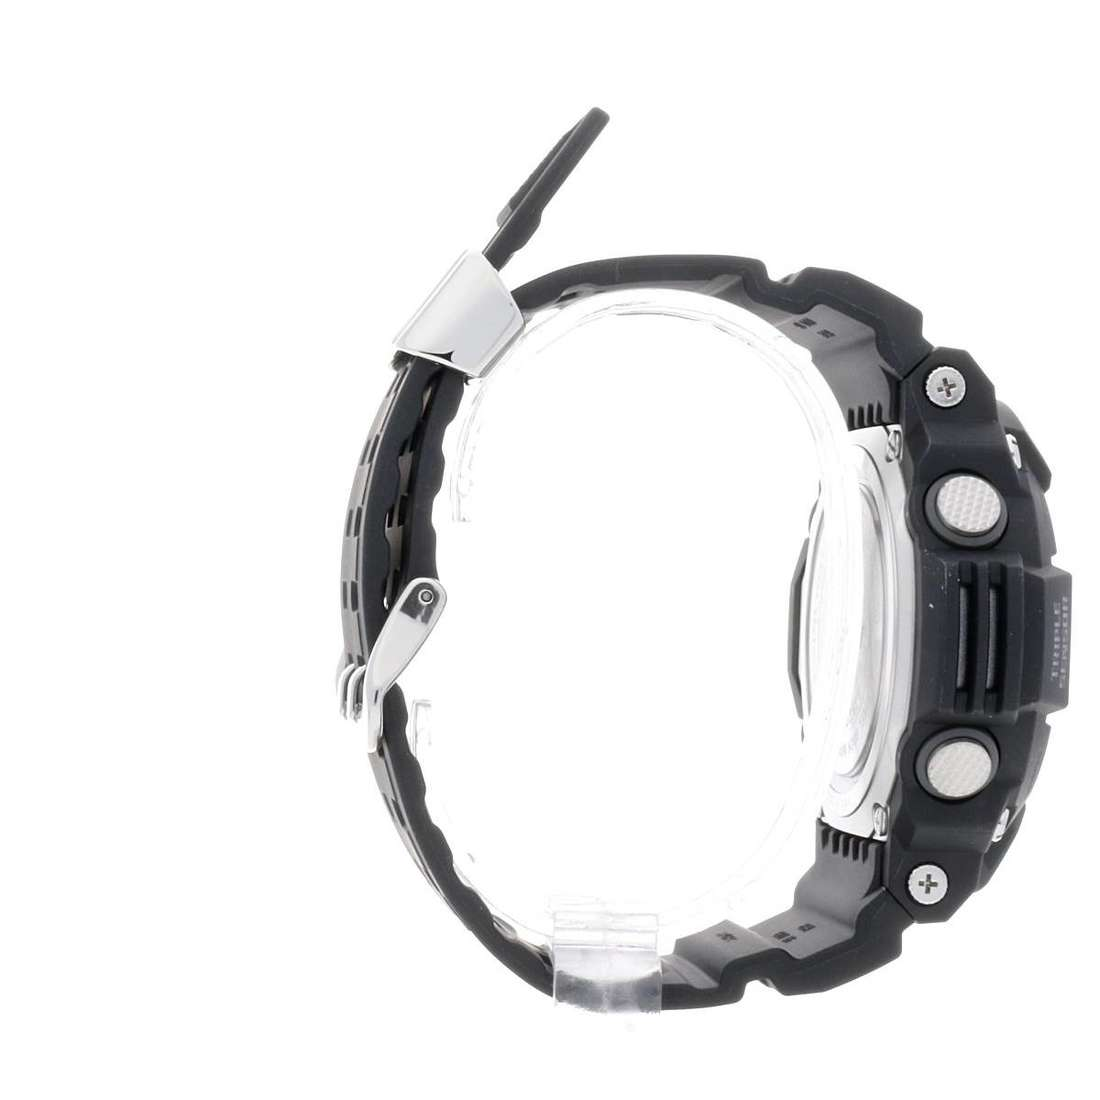 acquista montres homme Casio GW-9400-1ER